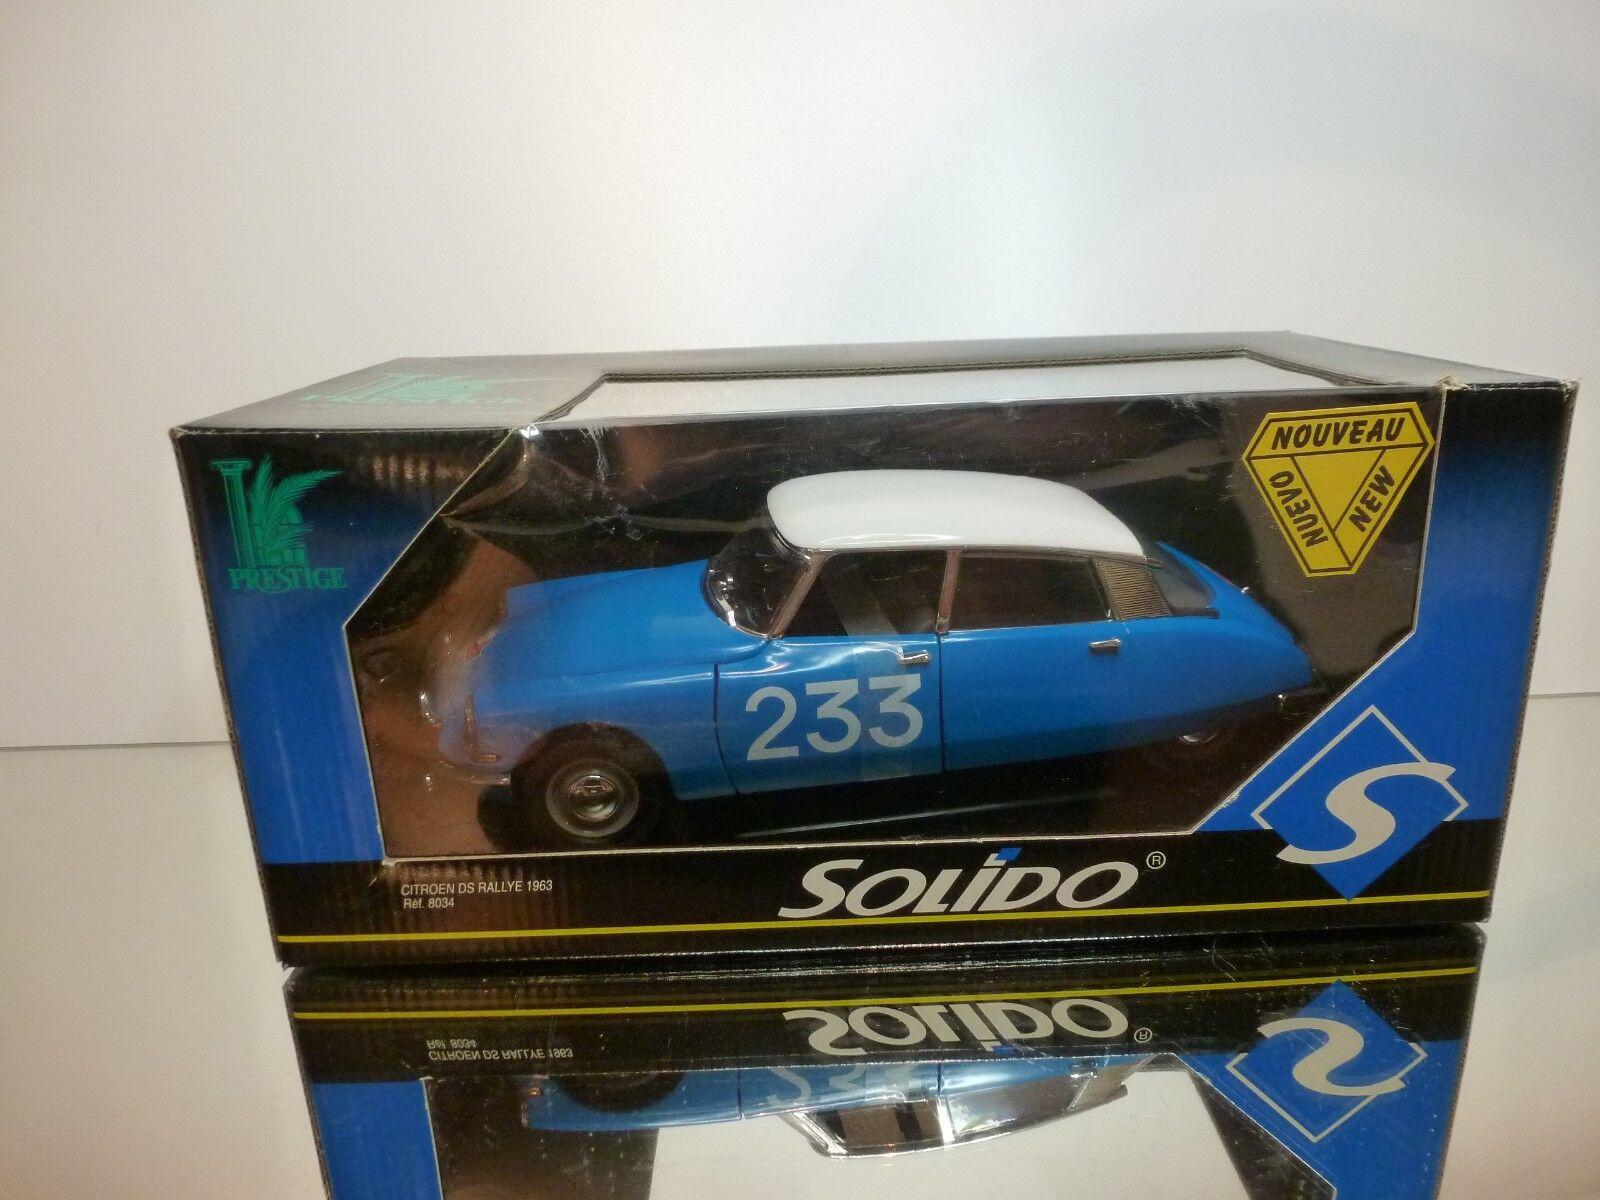 SOLIDO 8034 CITROEN DS RALLYE 1963  233 - azul 1 18 - EXCELLENT IN BOX